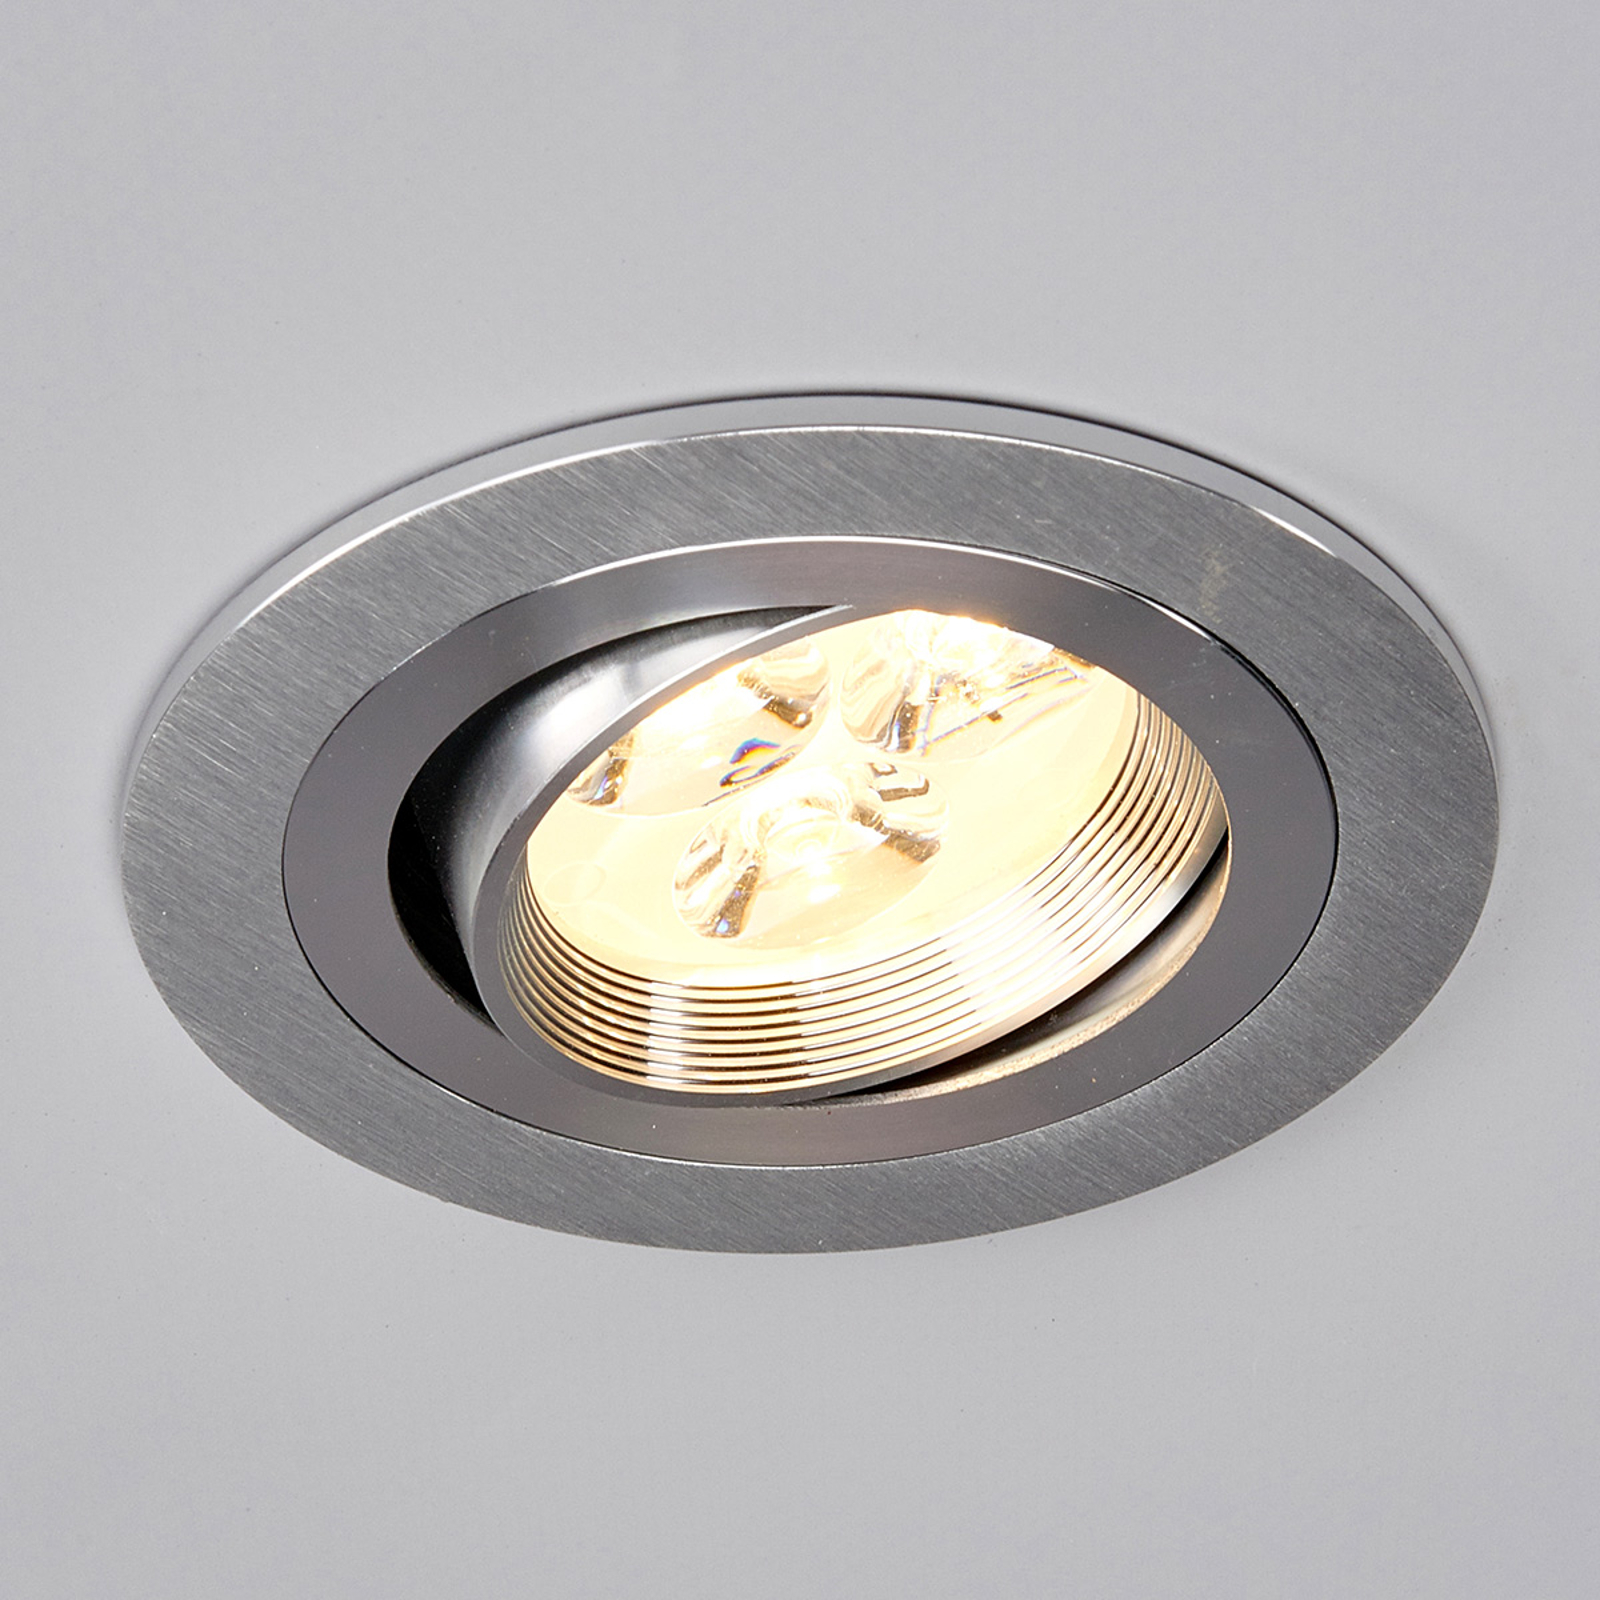 Ronde LED-inbouwspot Tjark van aluminium